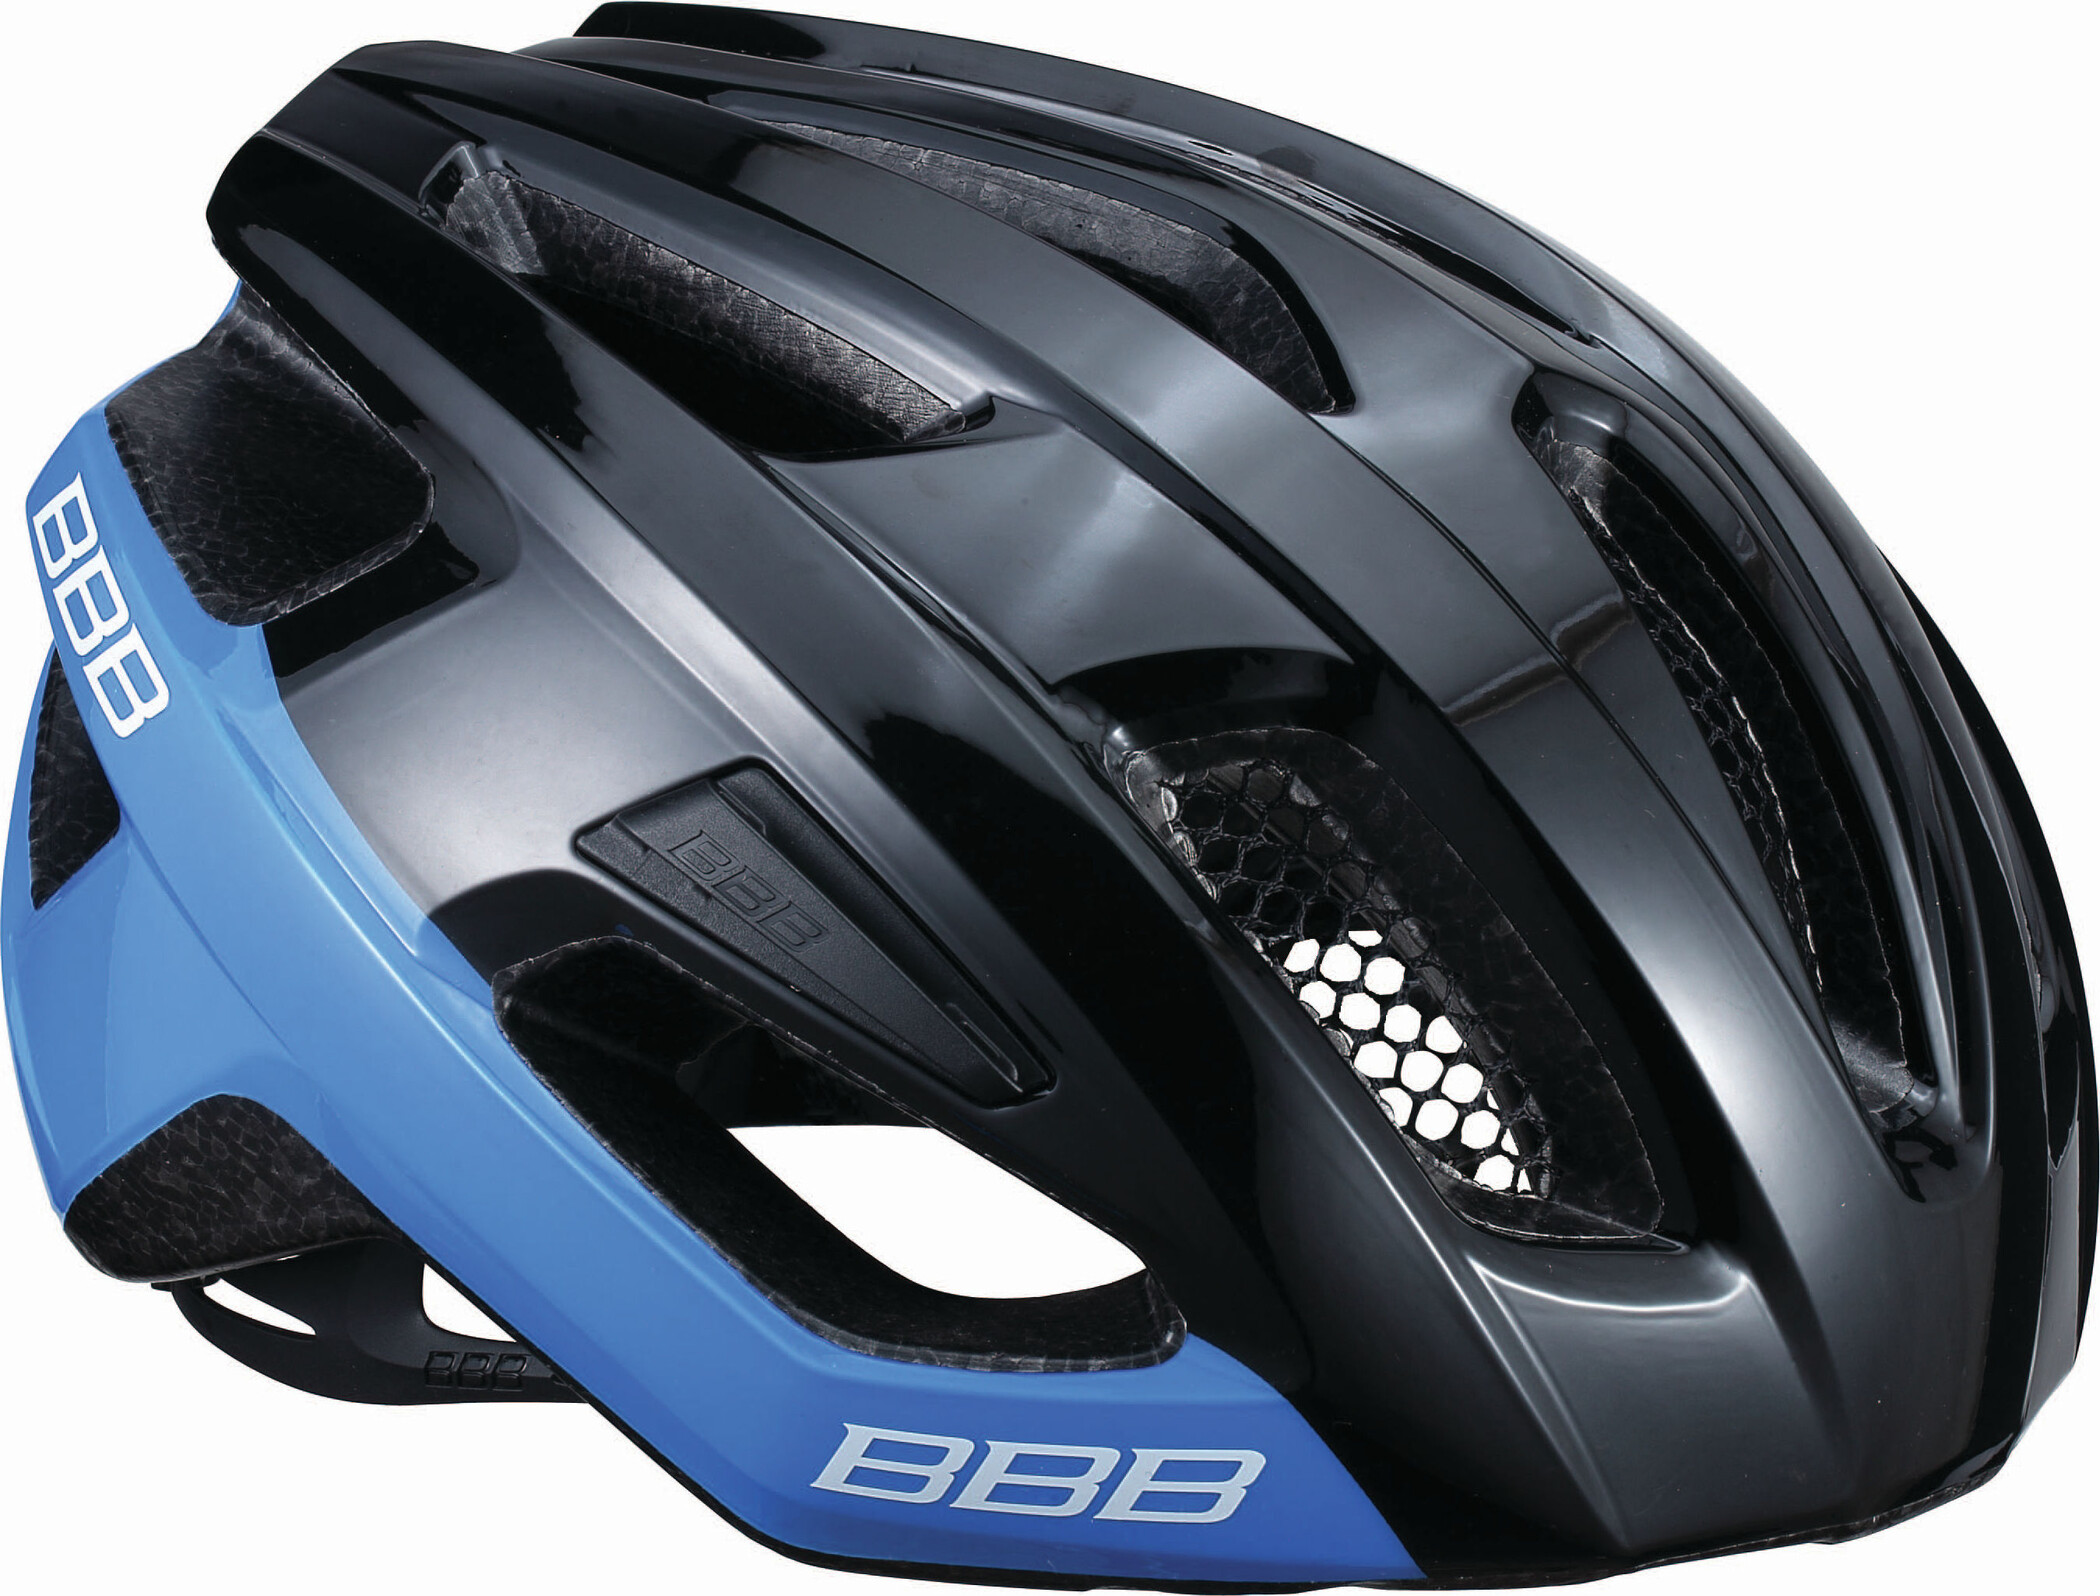 Fahrradteile & -komponenten Reverse Stickerkit für Base DH Felge 650B light blau Felgen